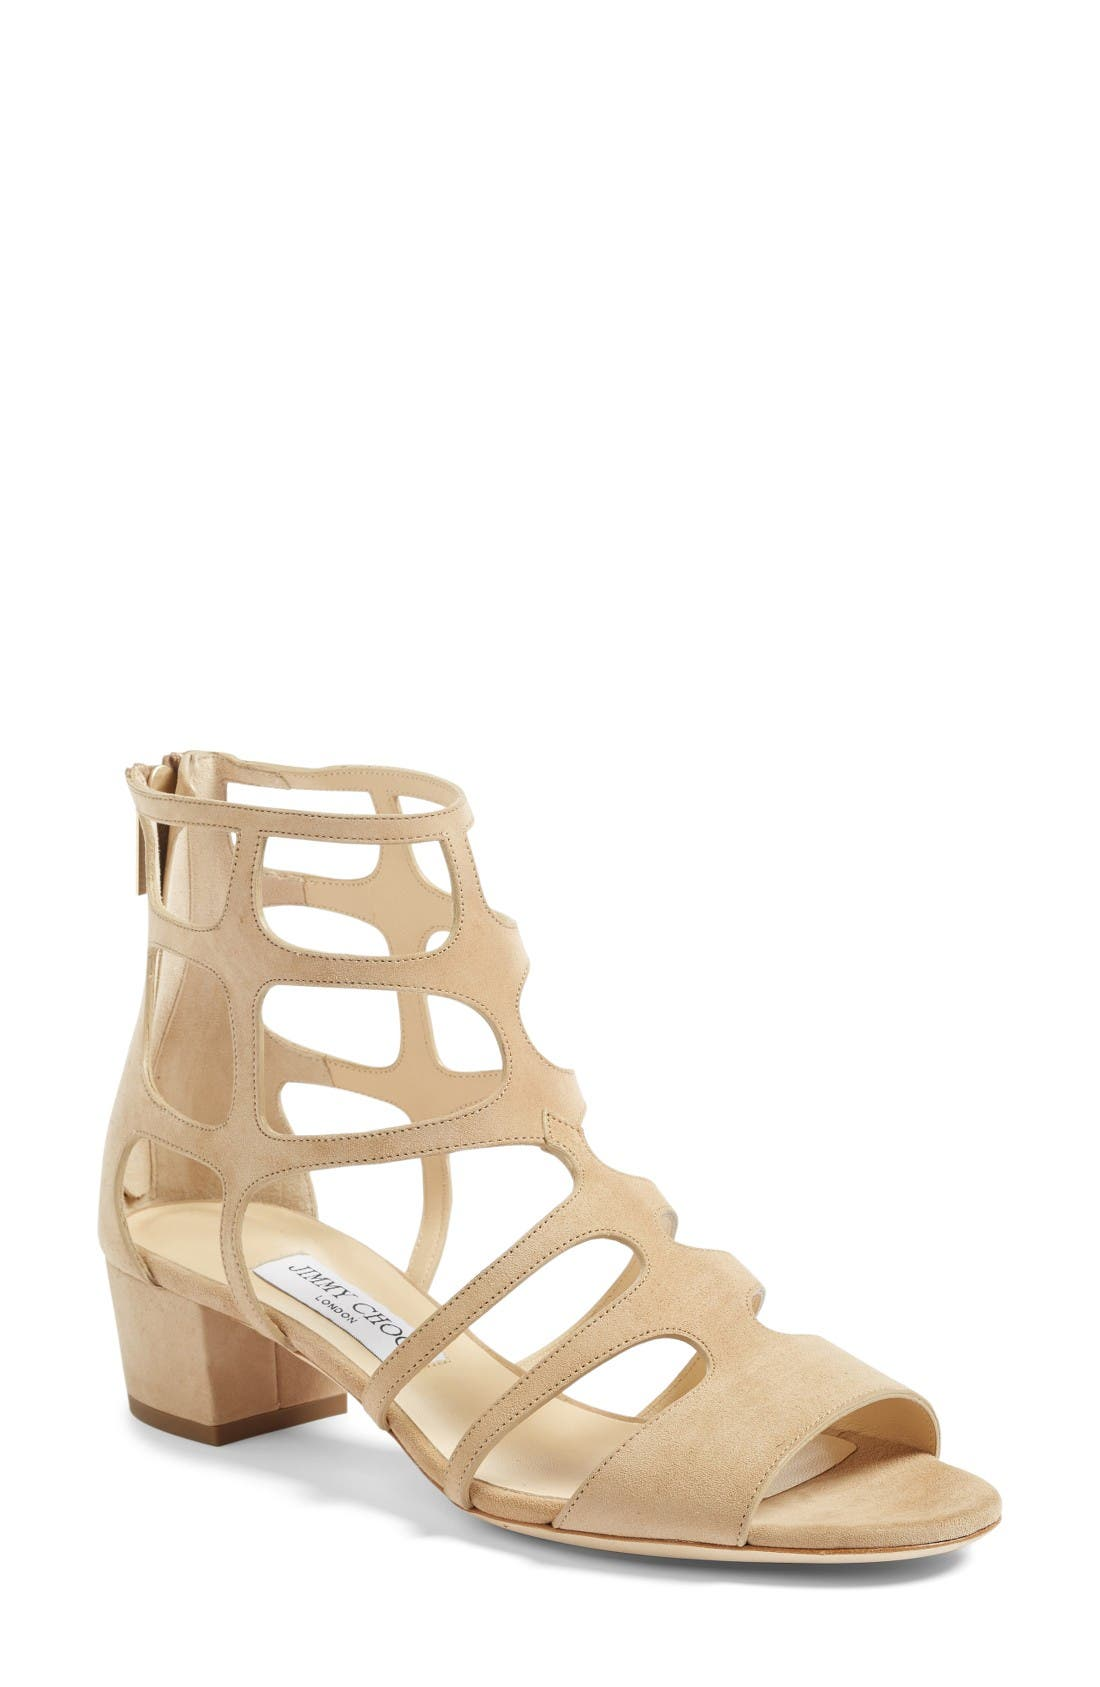 Alternate Image 1 Selected - Jimmy Choo Ren Block Heel Sandal (Women)